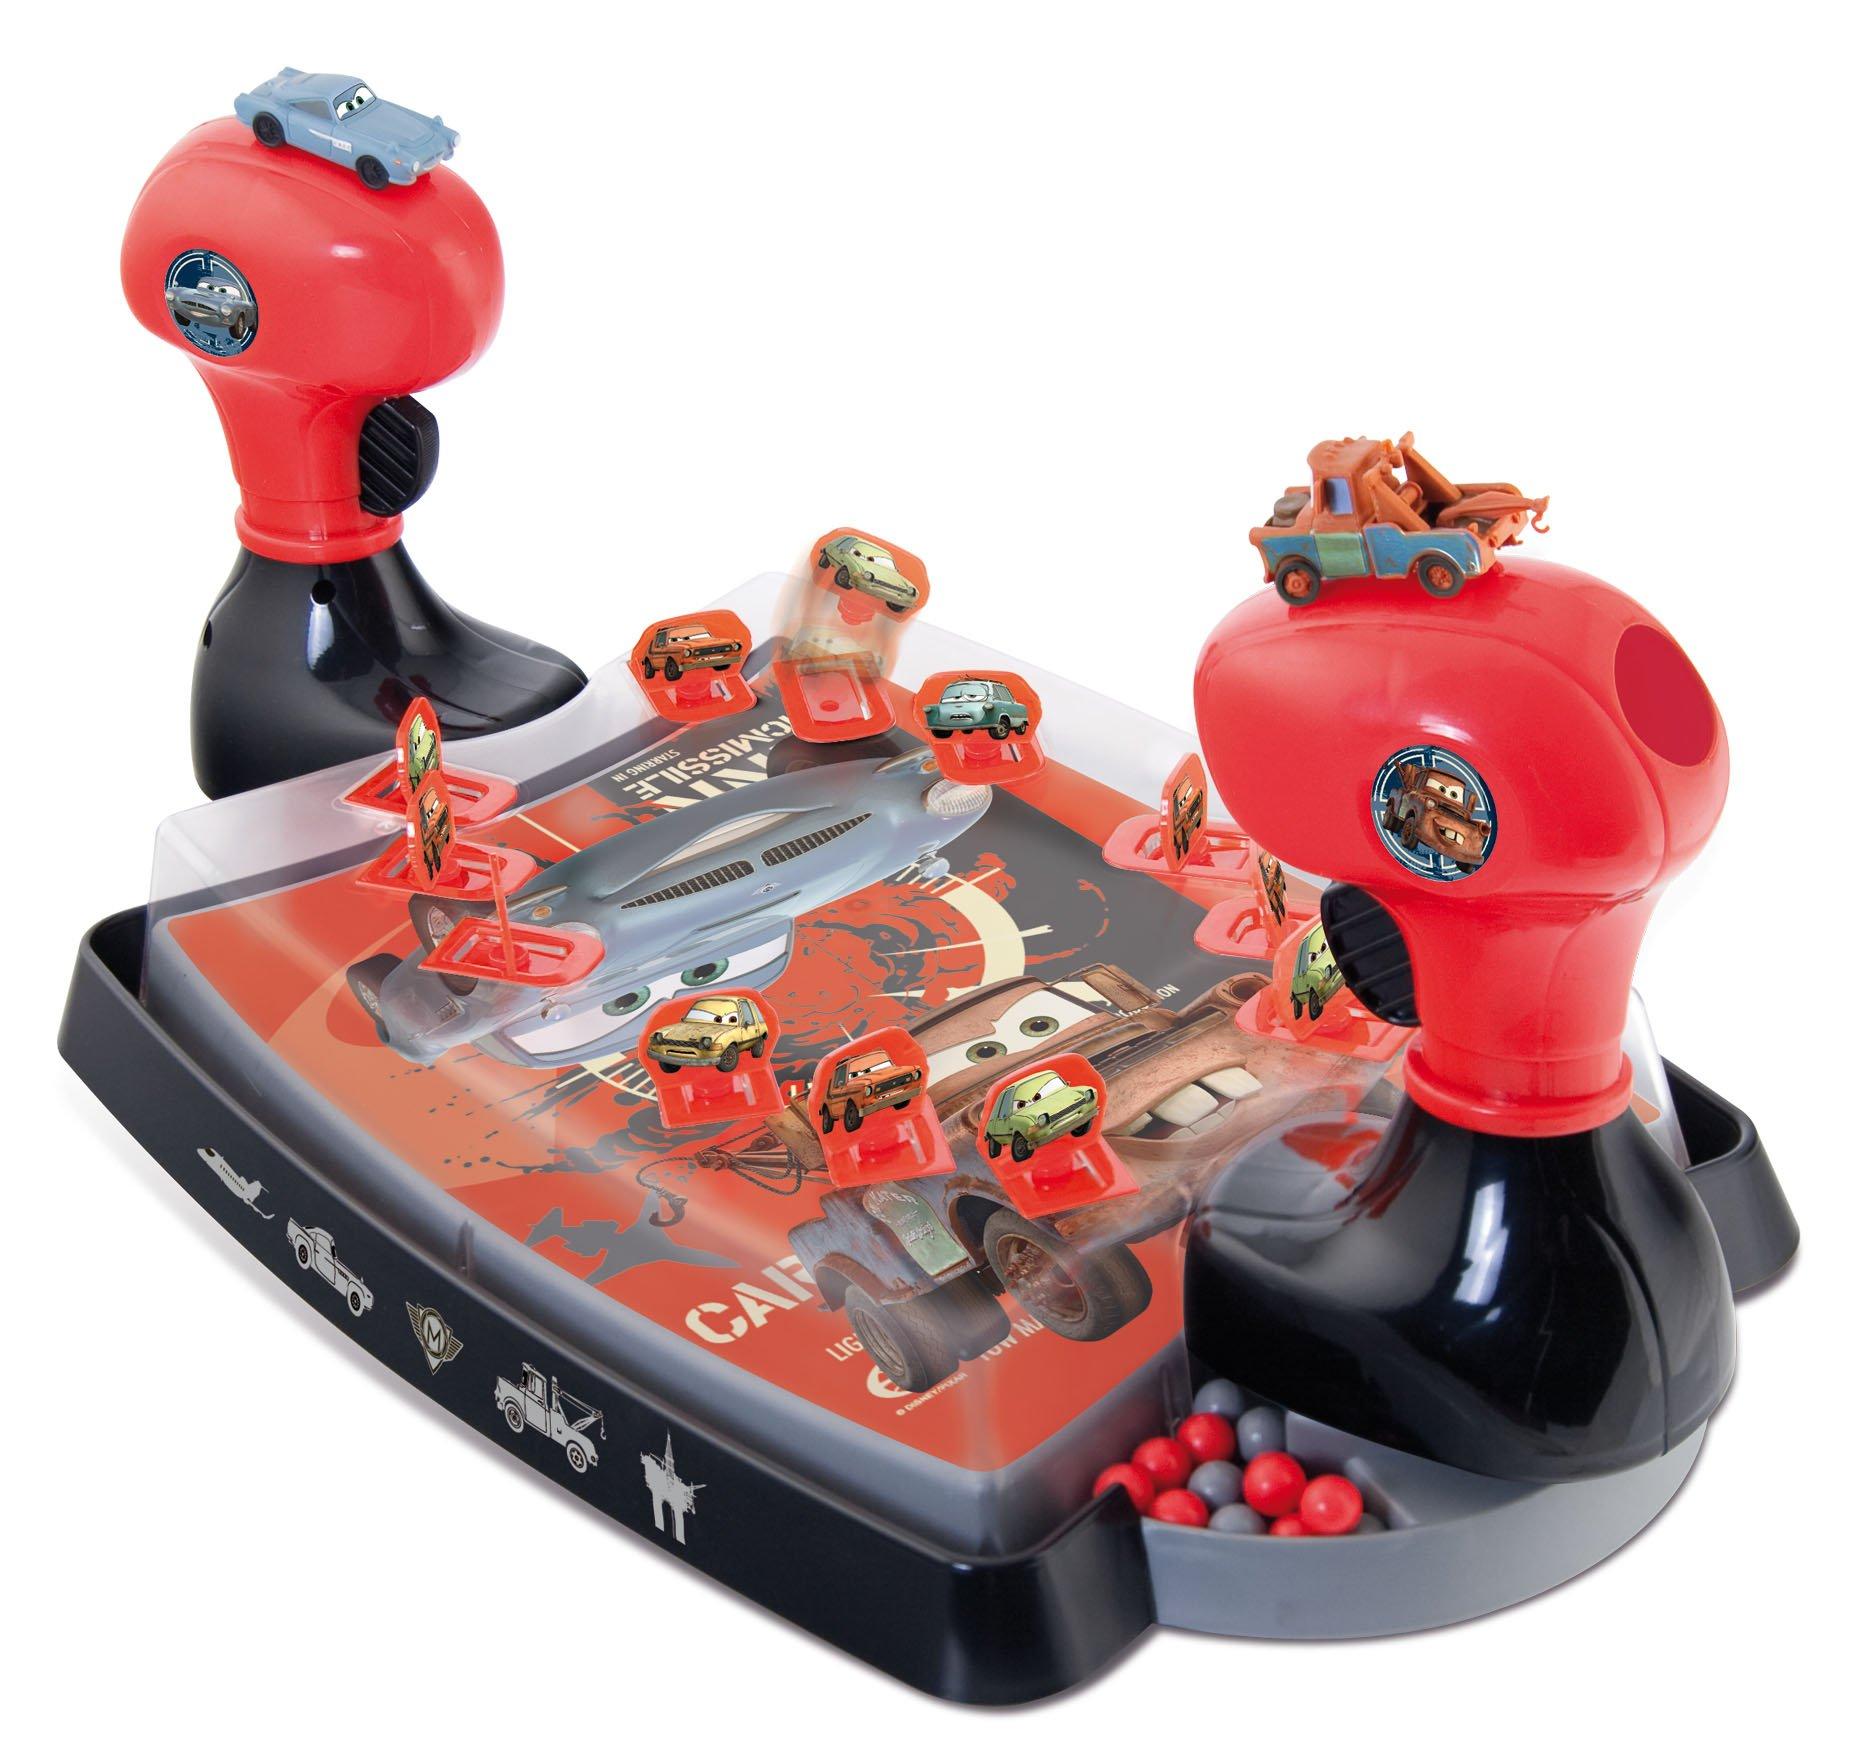 Cars 2 Spy Battle Game Exclusive with Mater & McFinn Disney Pixar